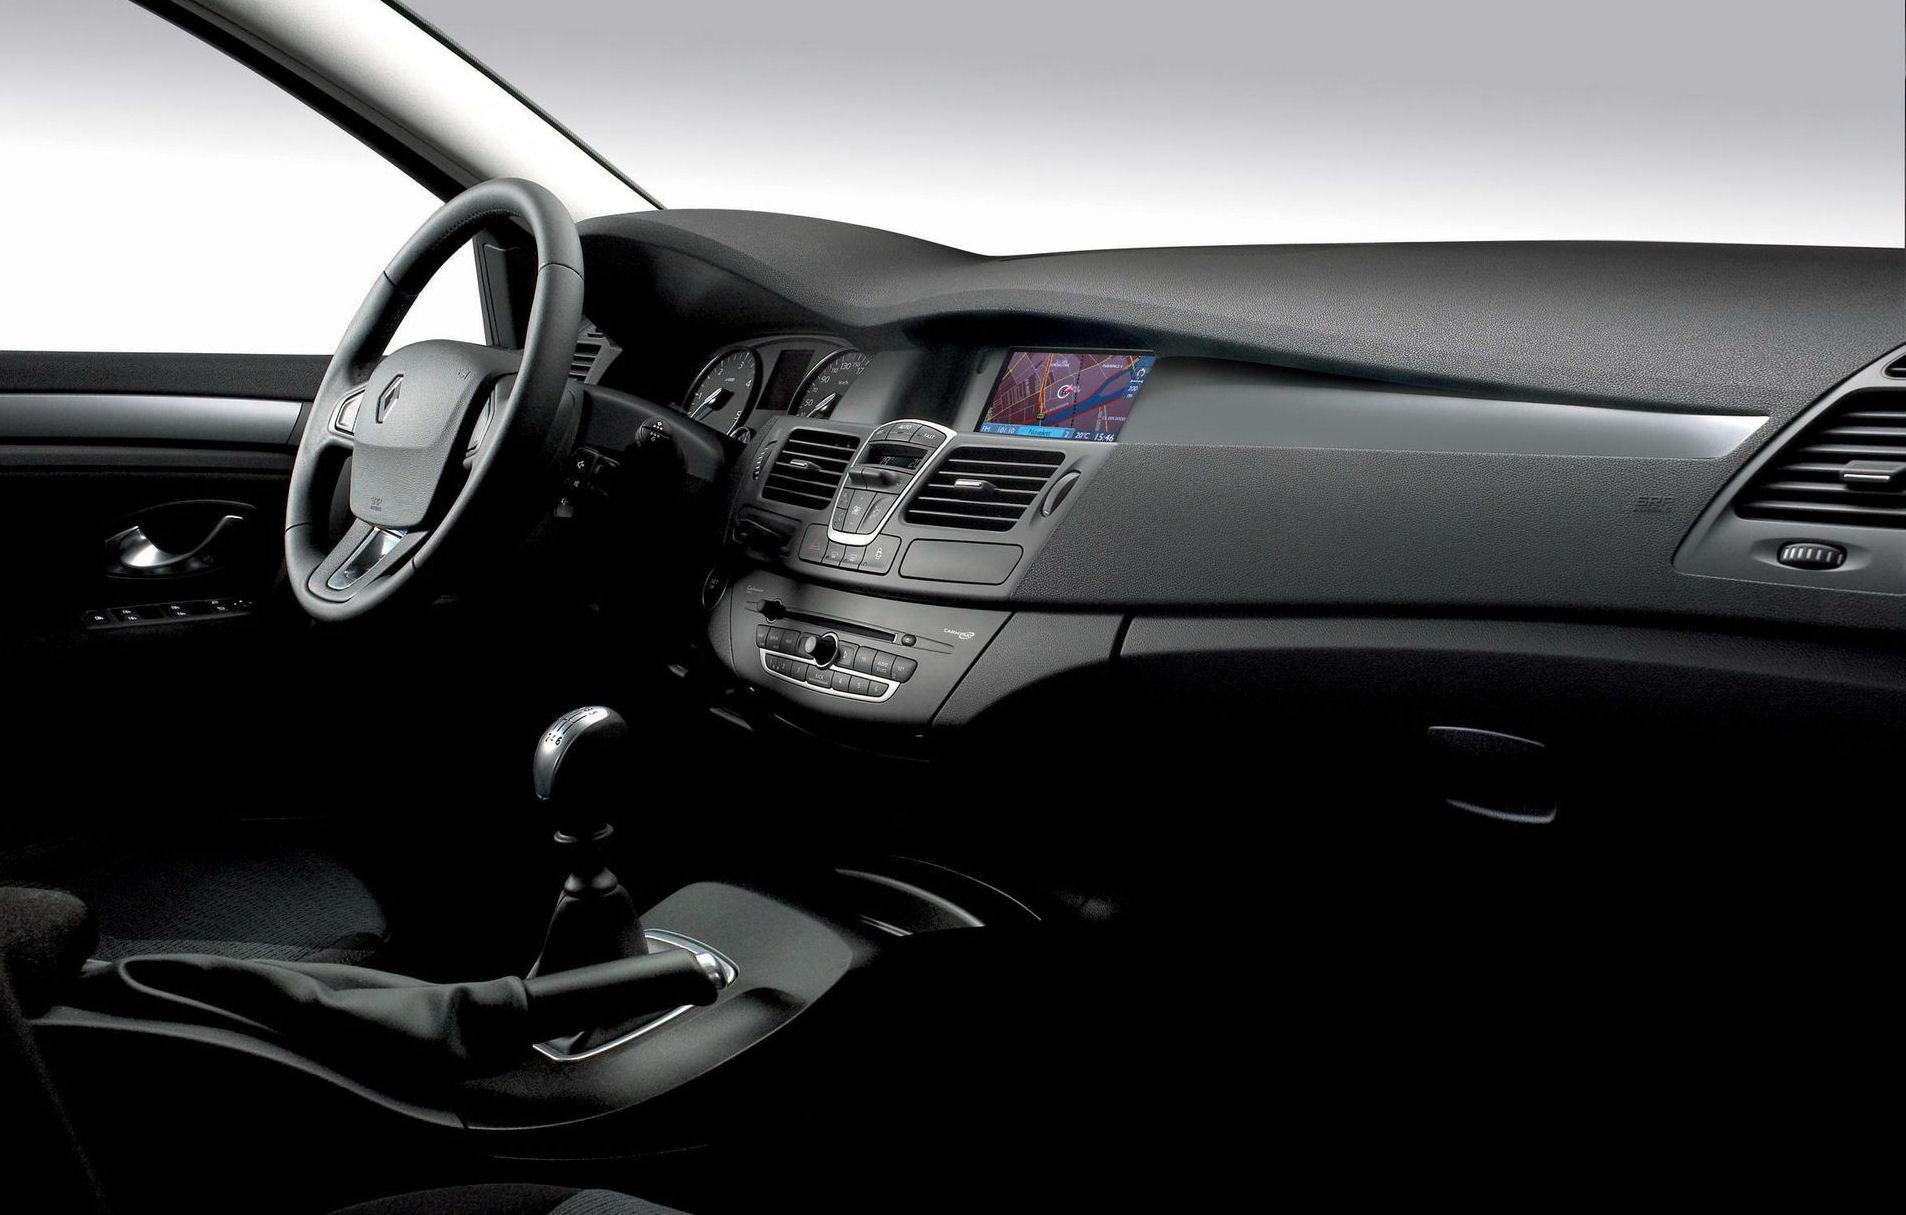 Intérieur - 1/1 - Renault Laguna 3 Black Edition (2009) - http://new ...